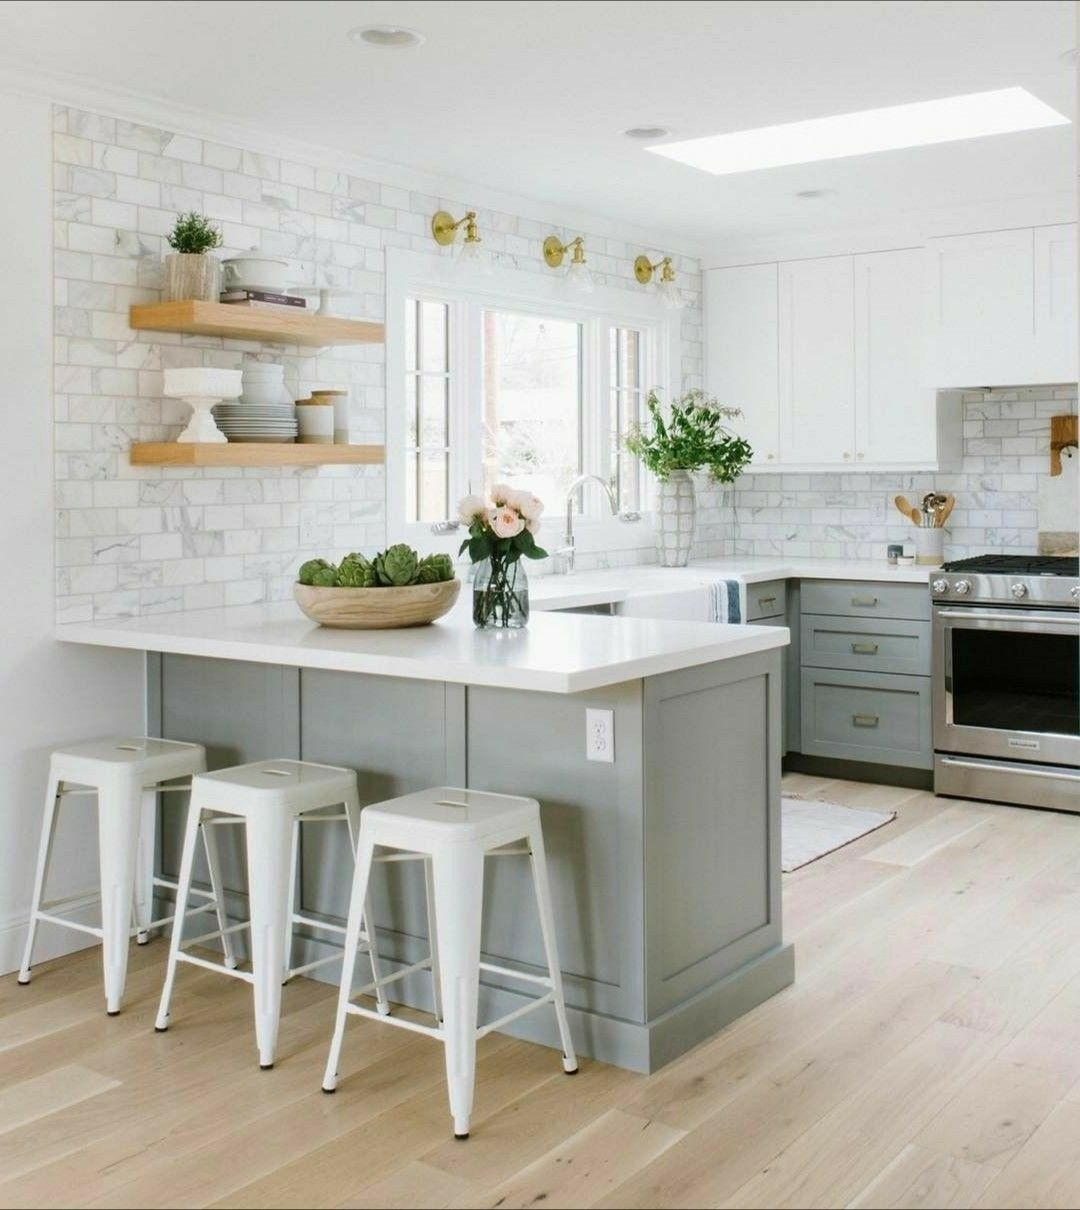 Overhead Kitchen Cabinet 2019: Interesting Backsplash To The Ceiling Treatment.